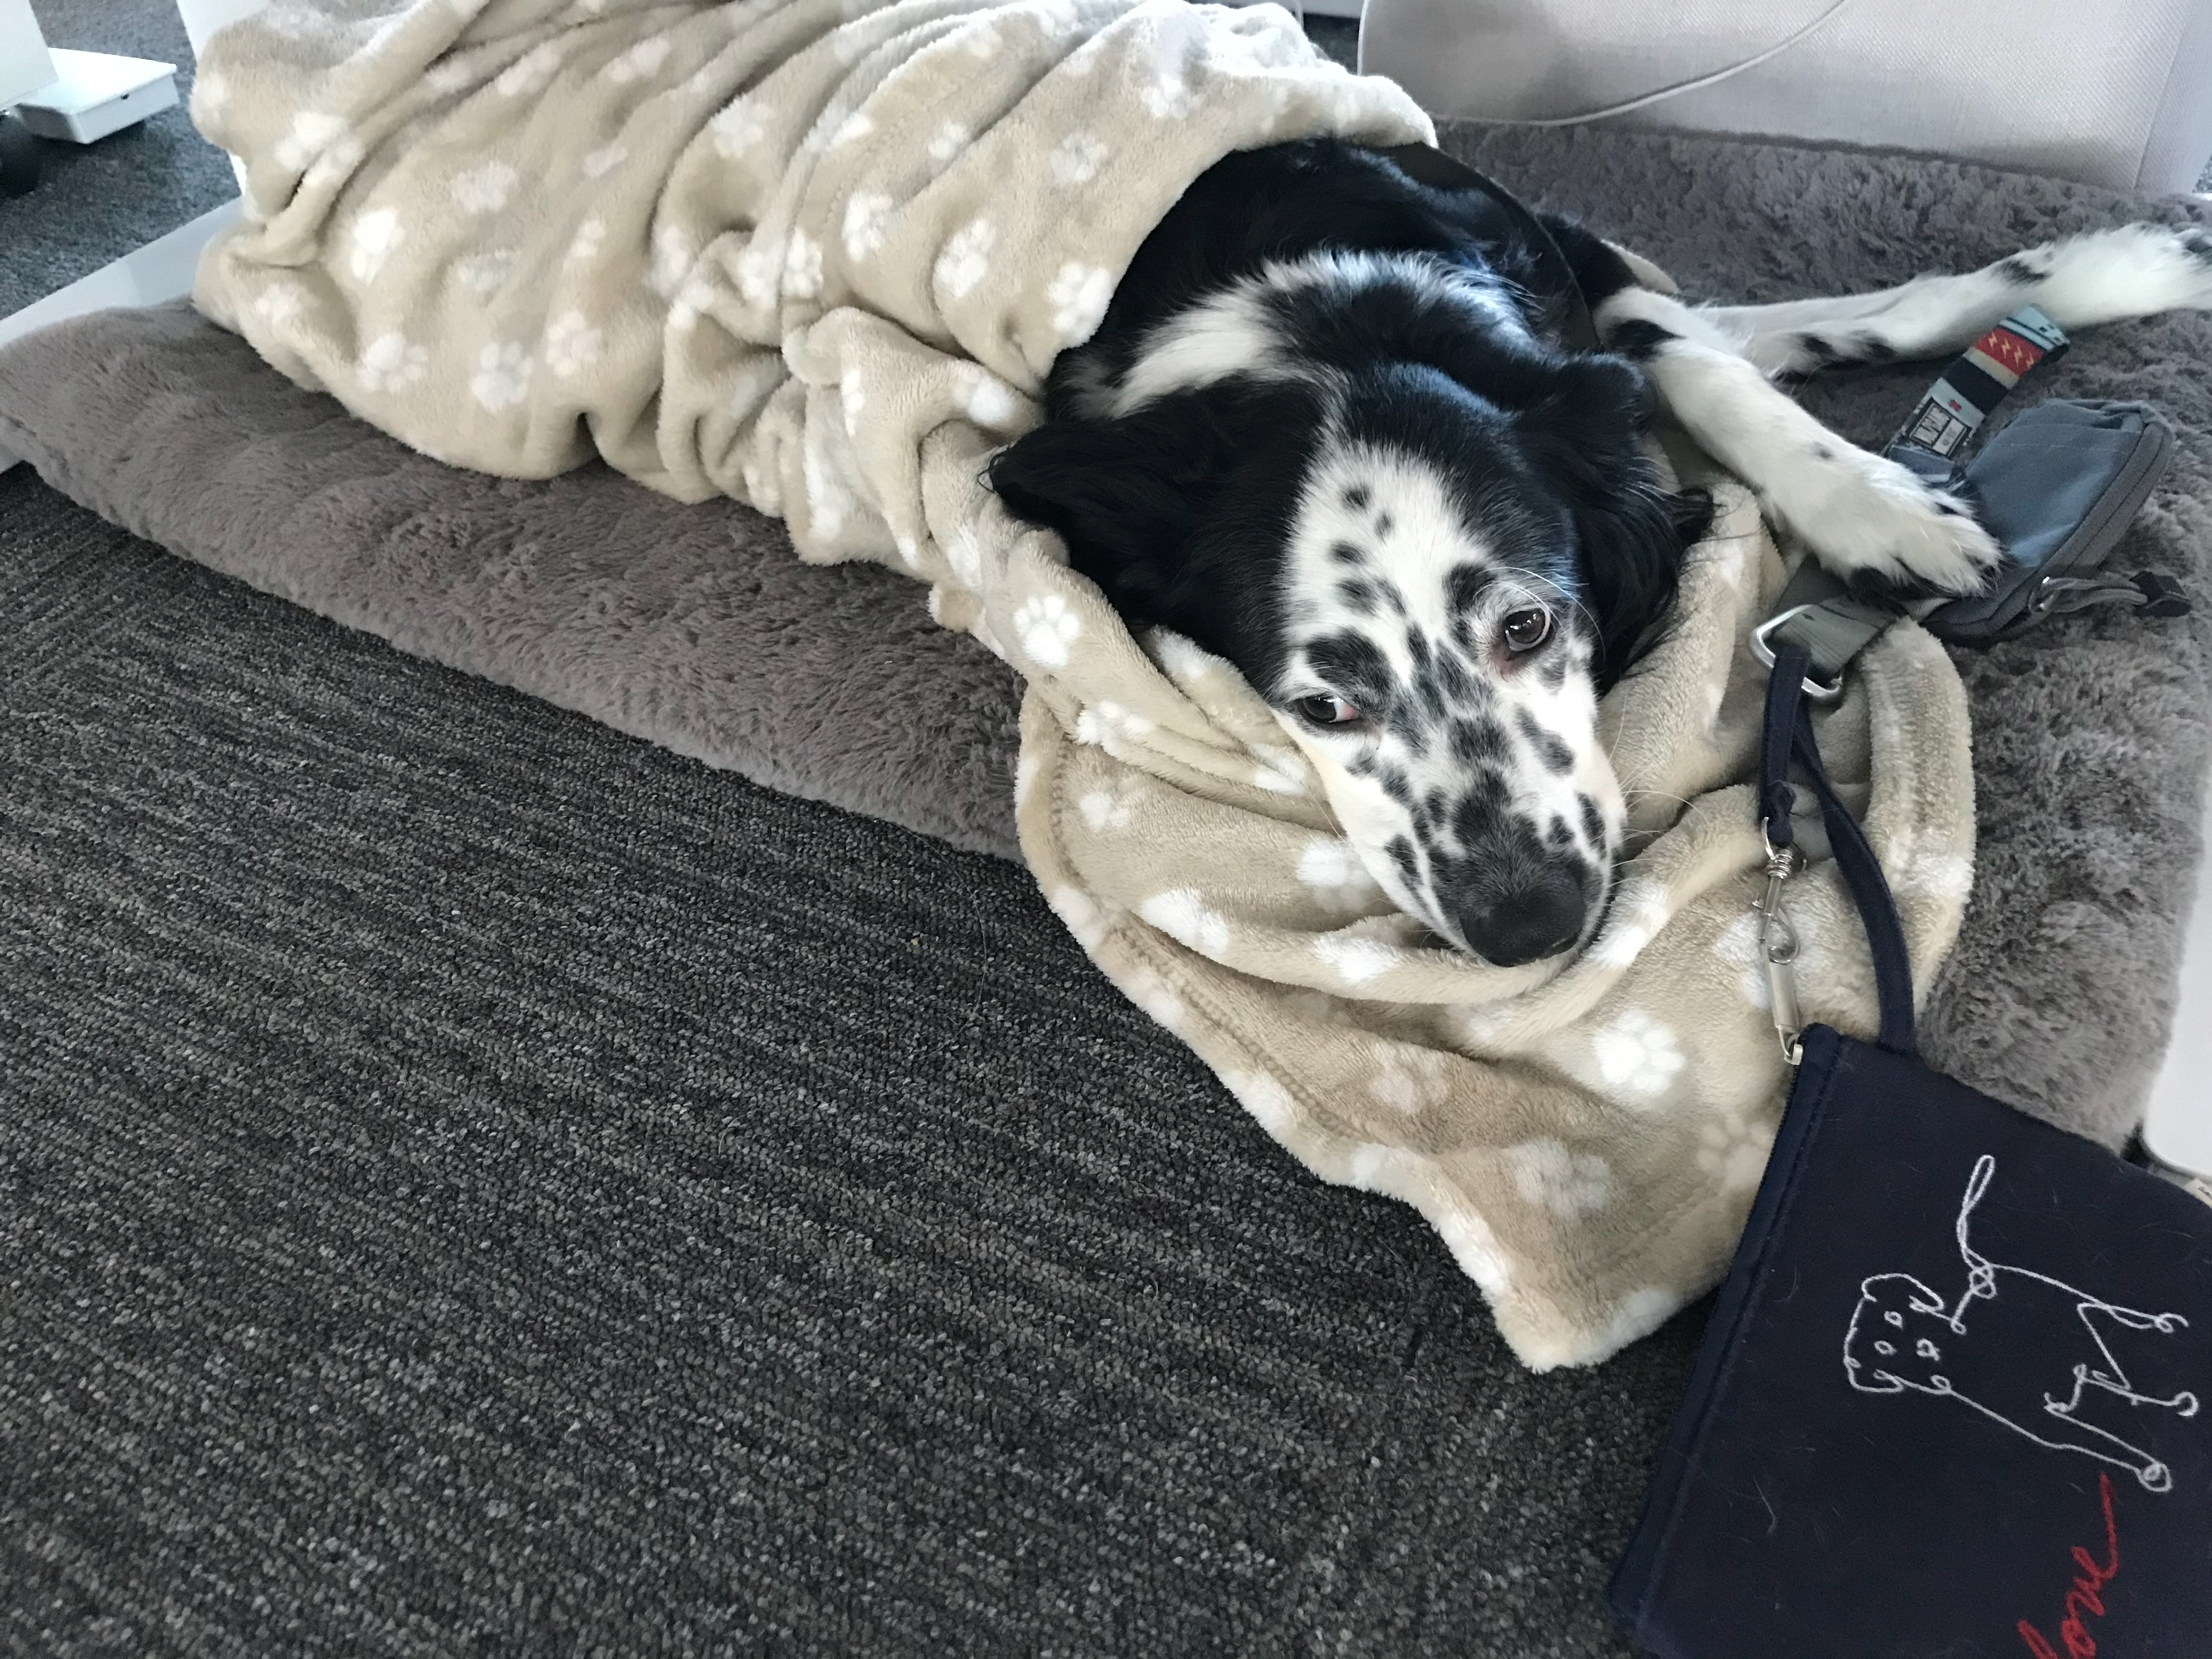 dog-lakai-in-bed.jpg